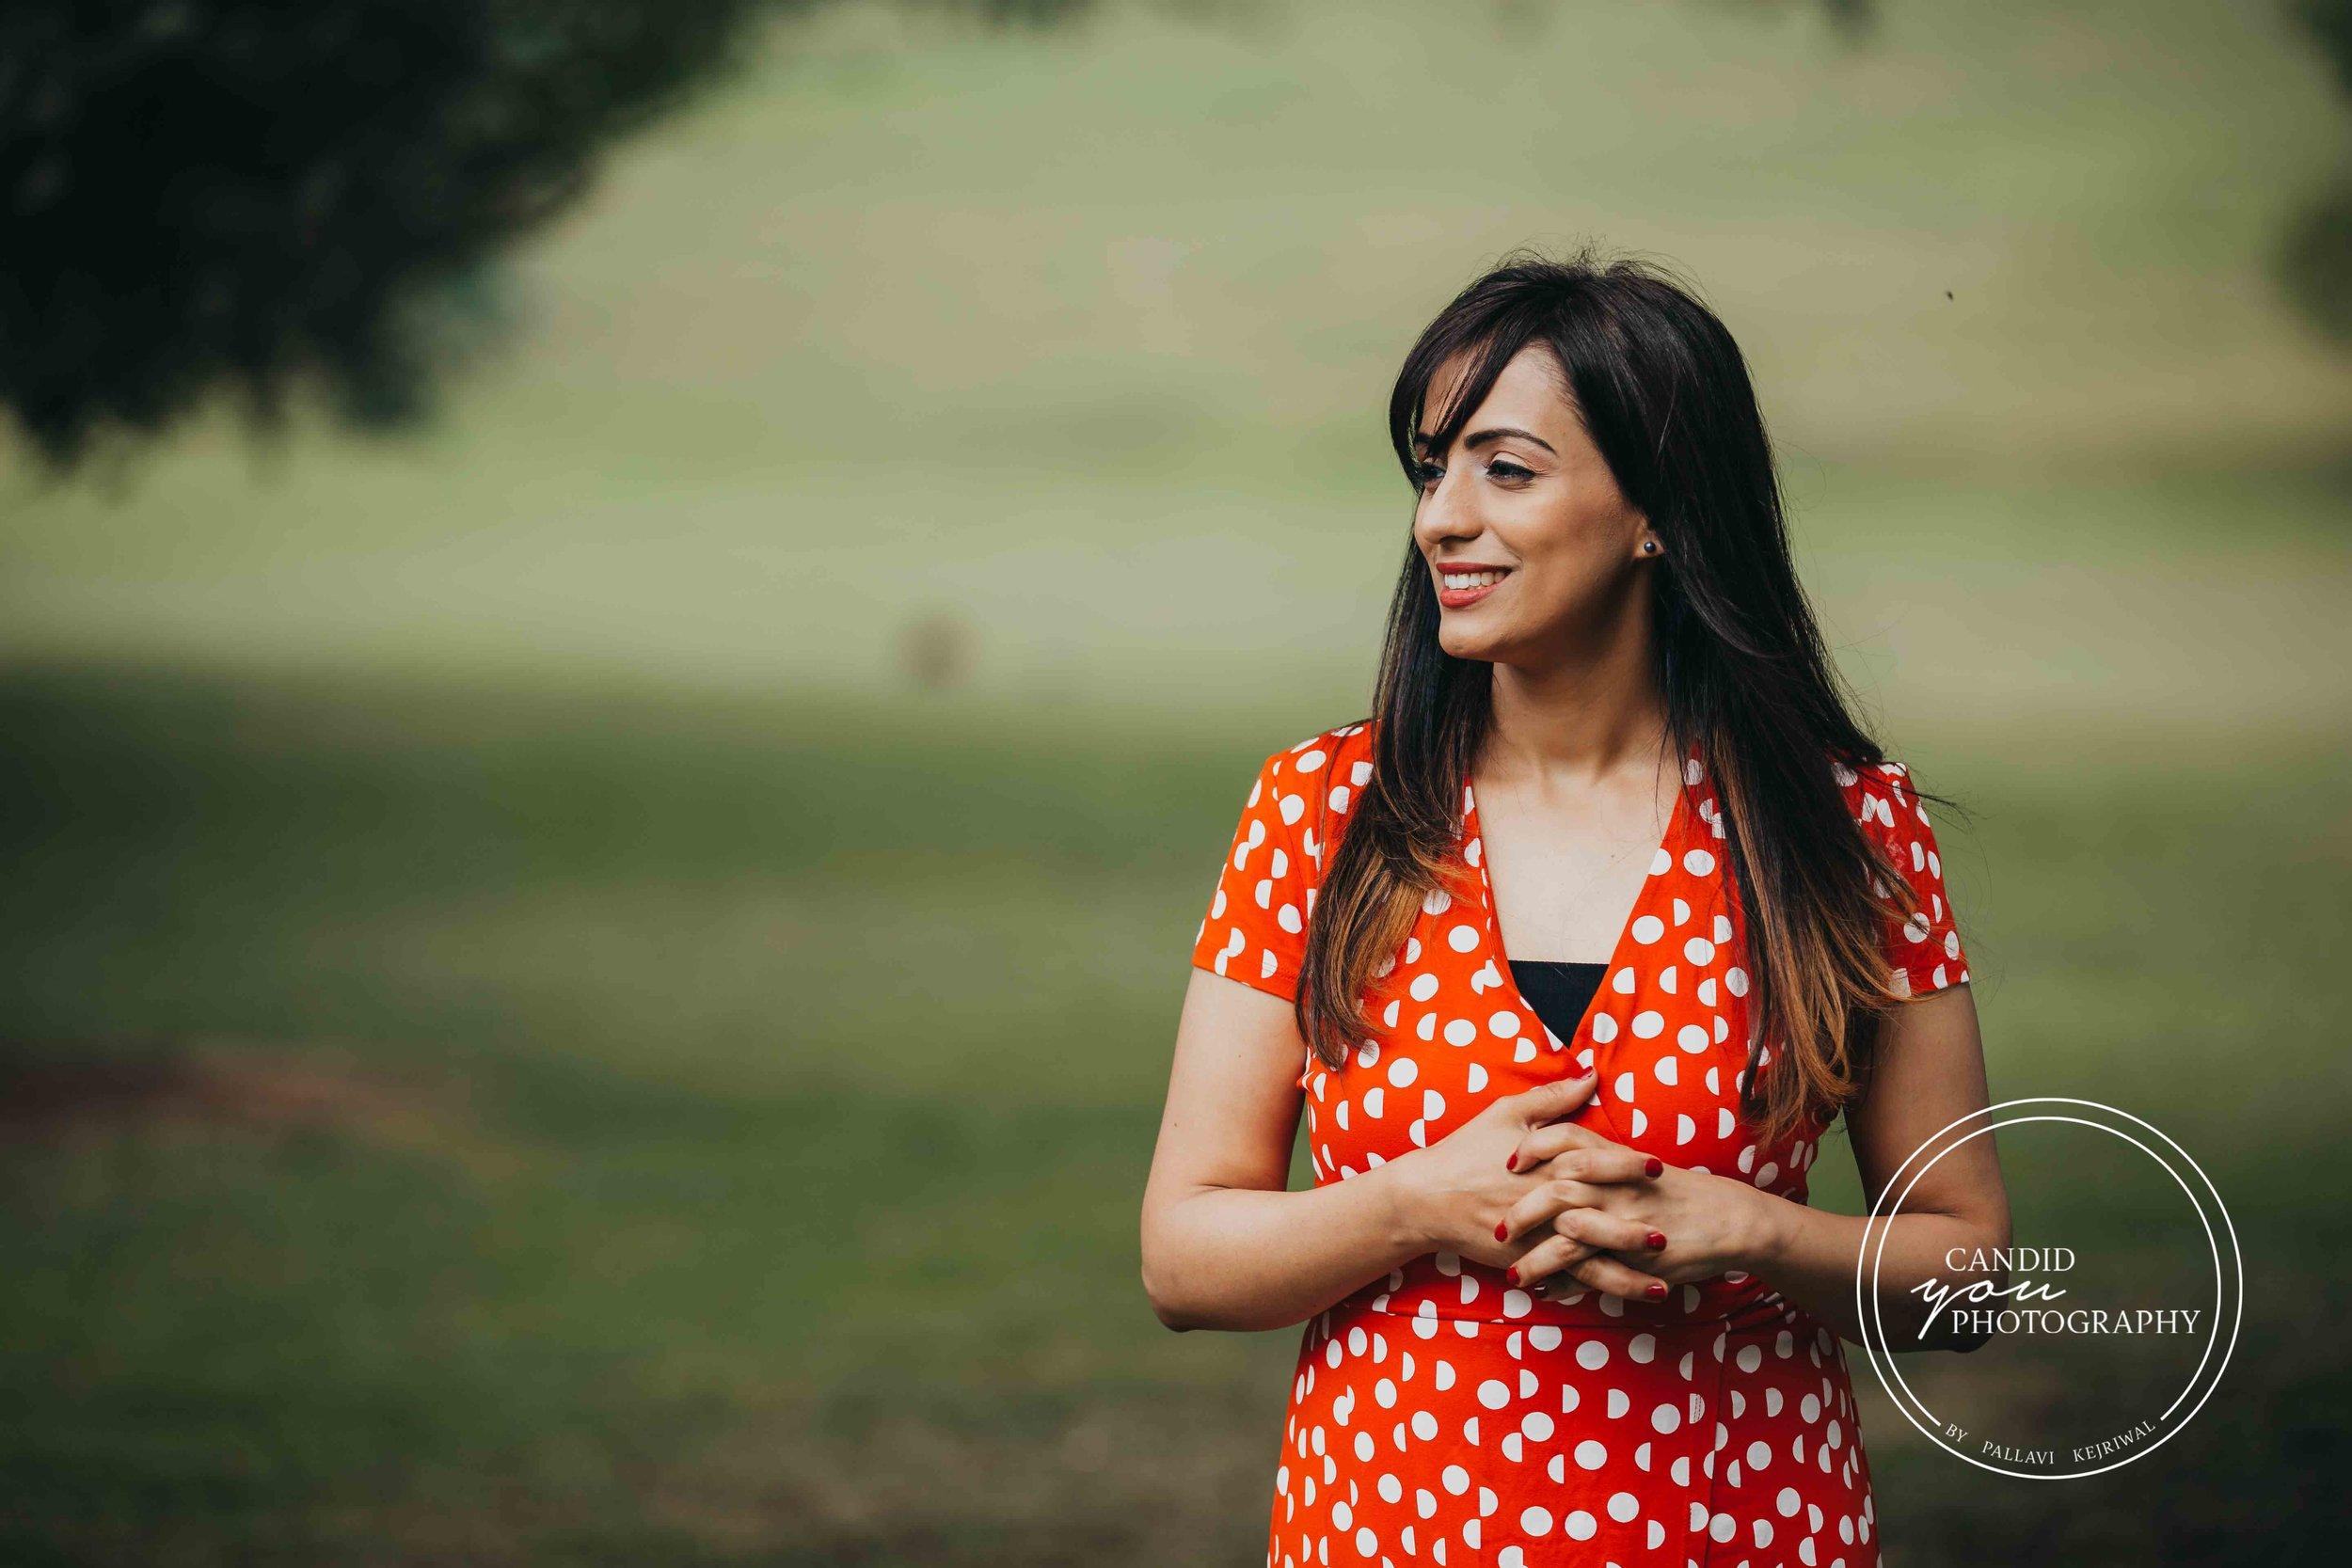 Beautiful lade in park in orange polka dot dress